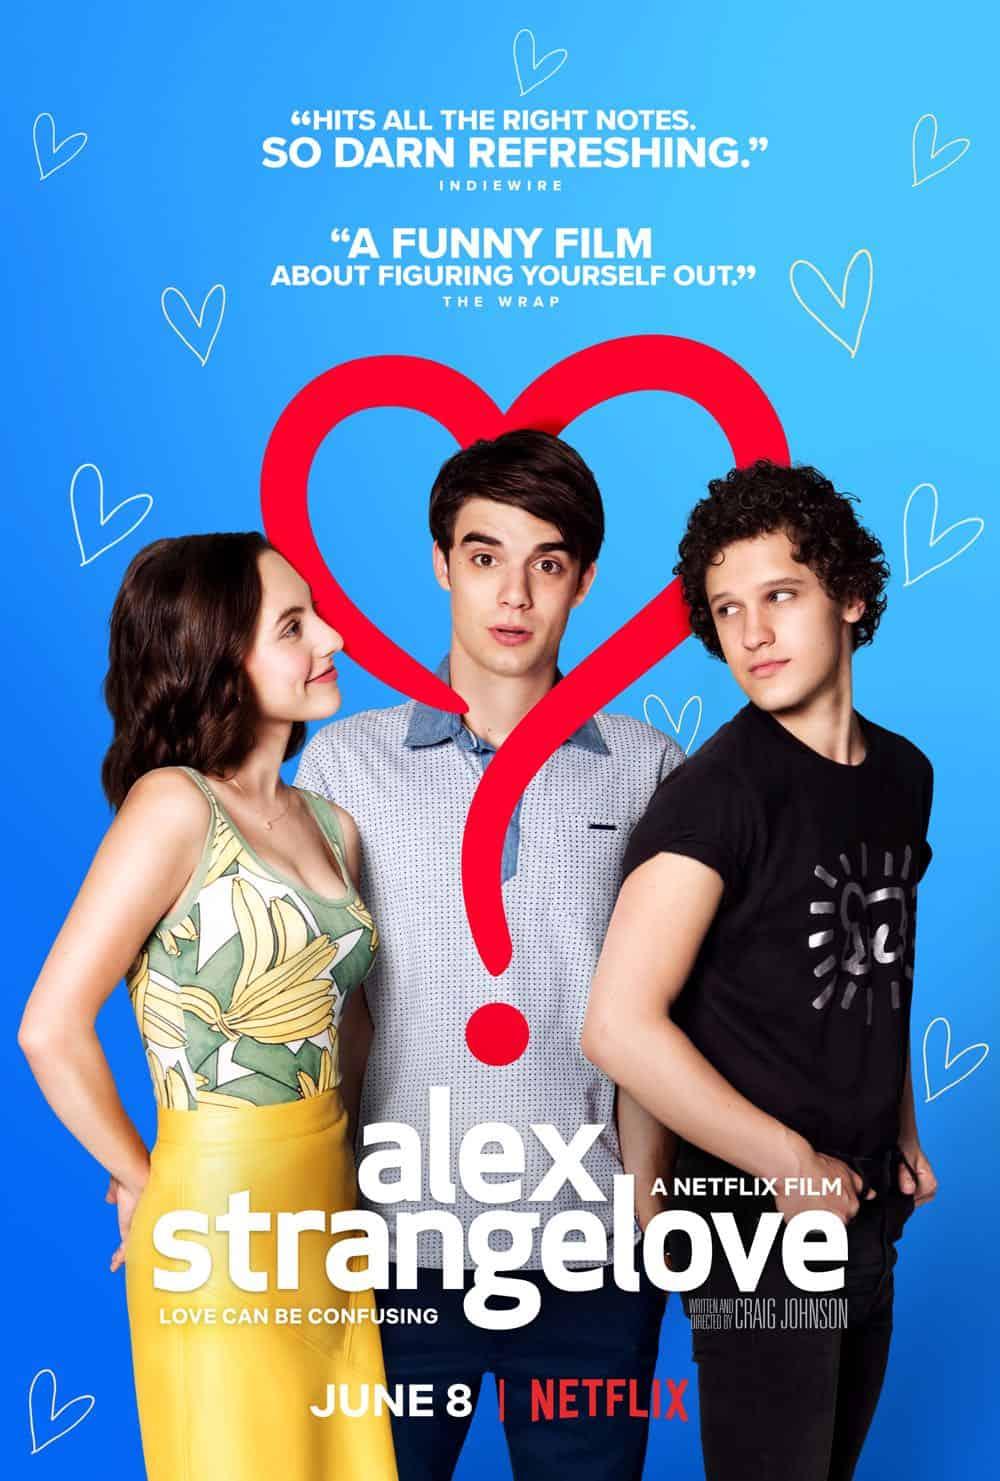 Alex-Strangelove-Poster-Key-Art-Netflix-Movie.jpg